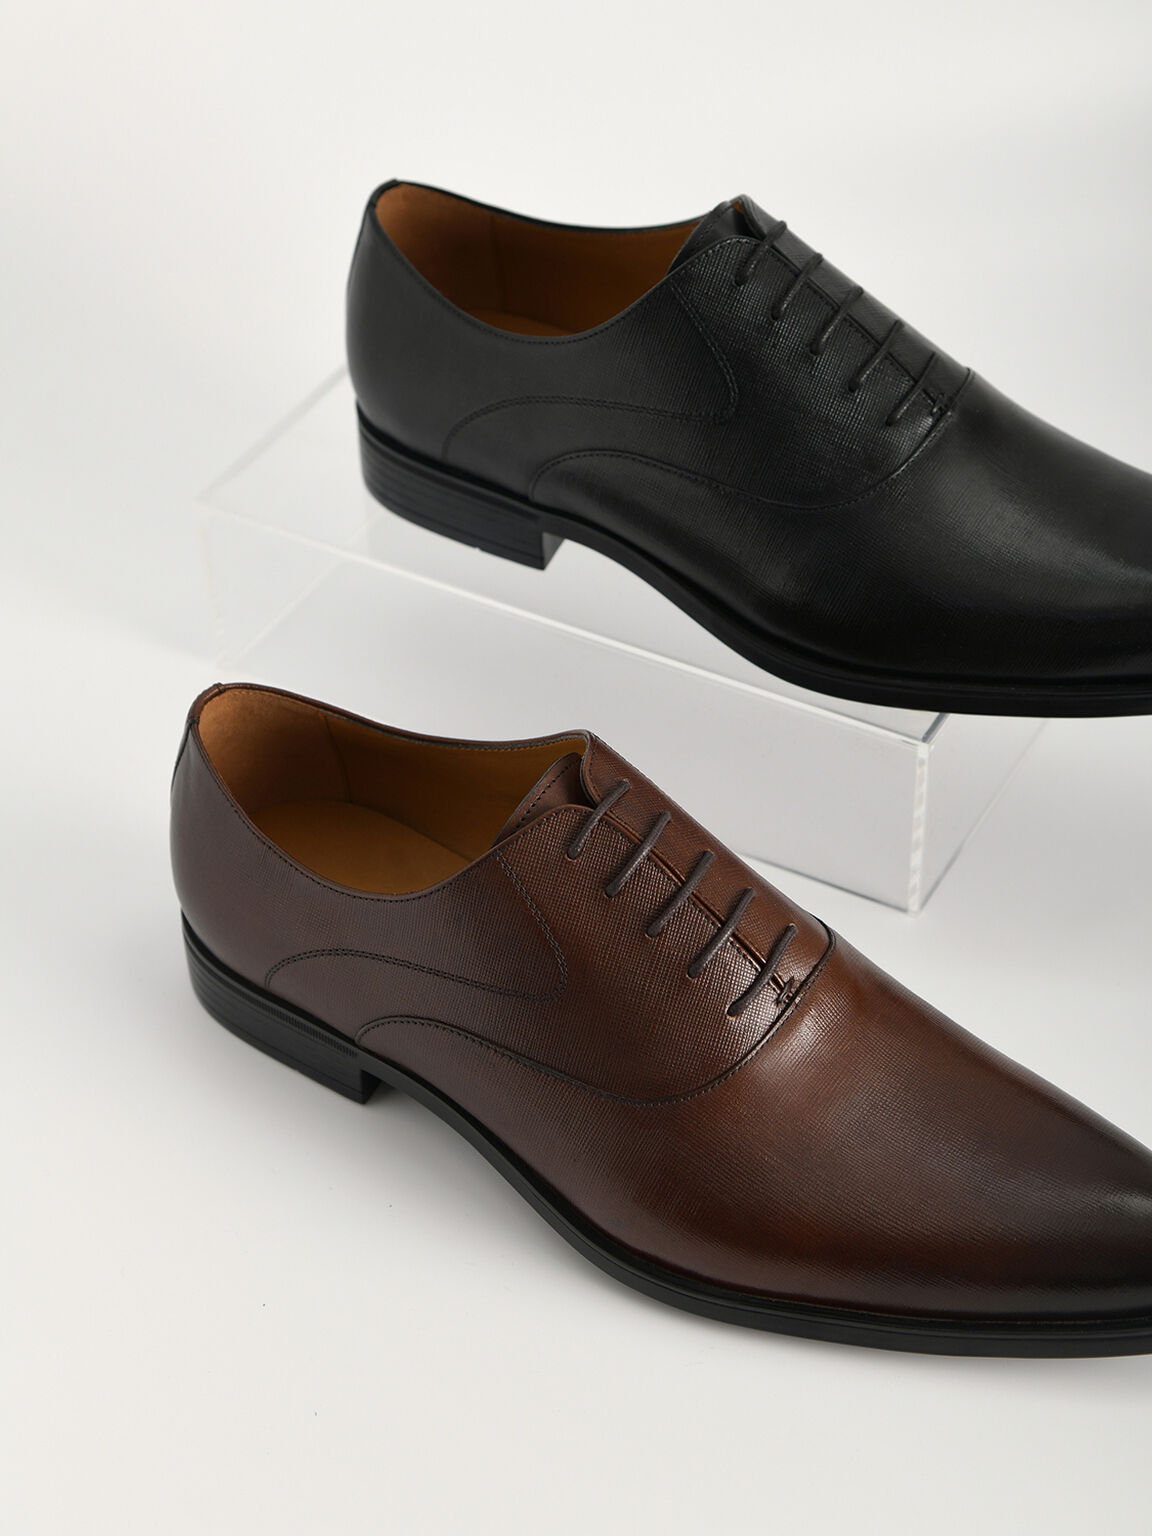 Textured Leather Oxfords, Black, hi-res